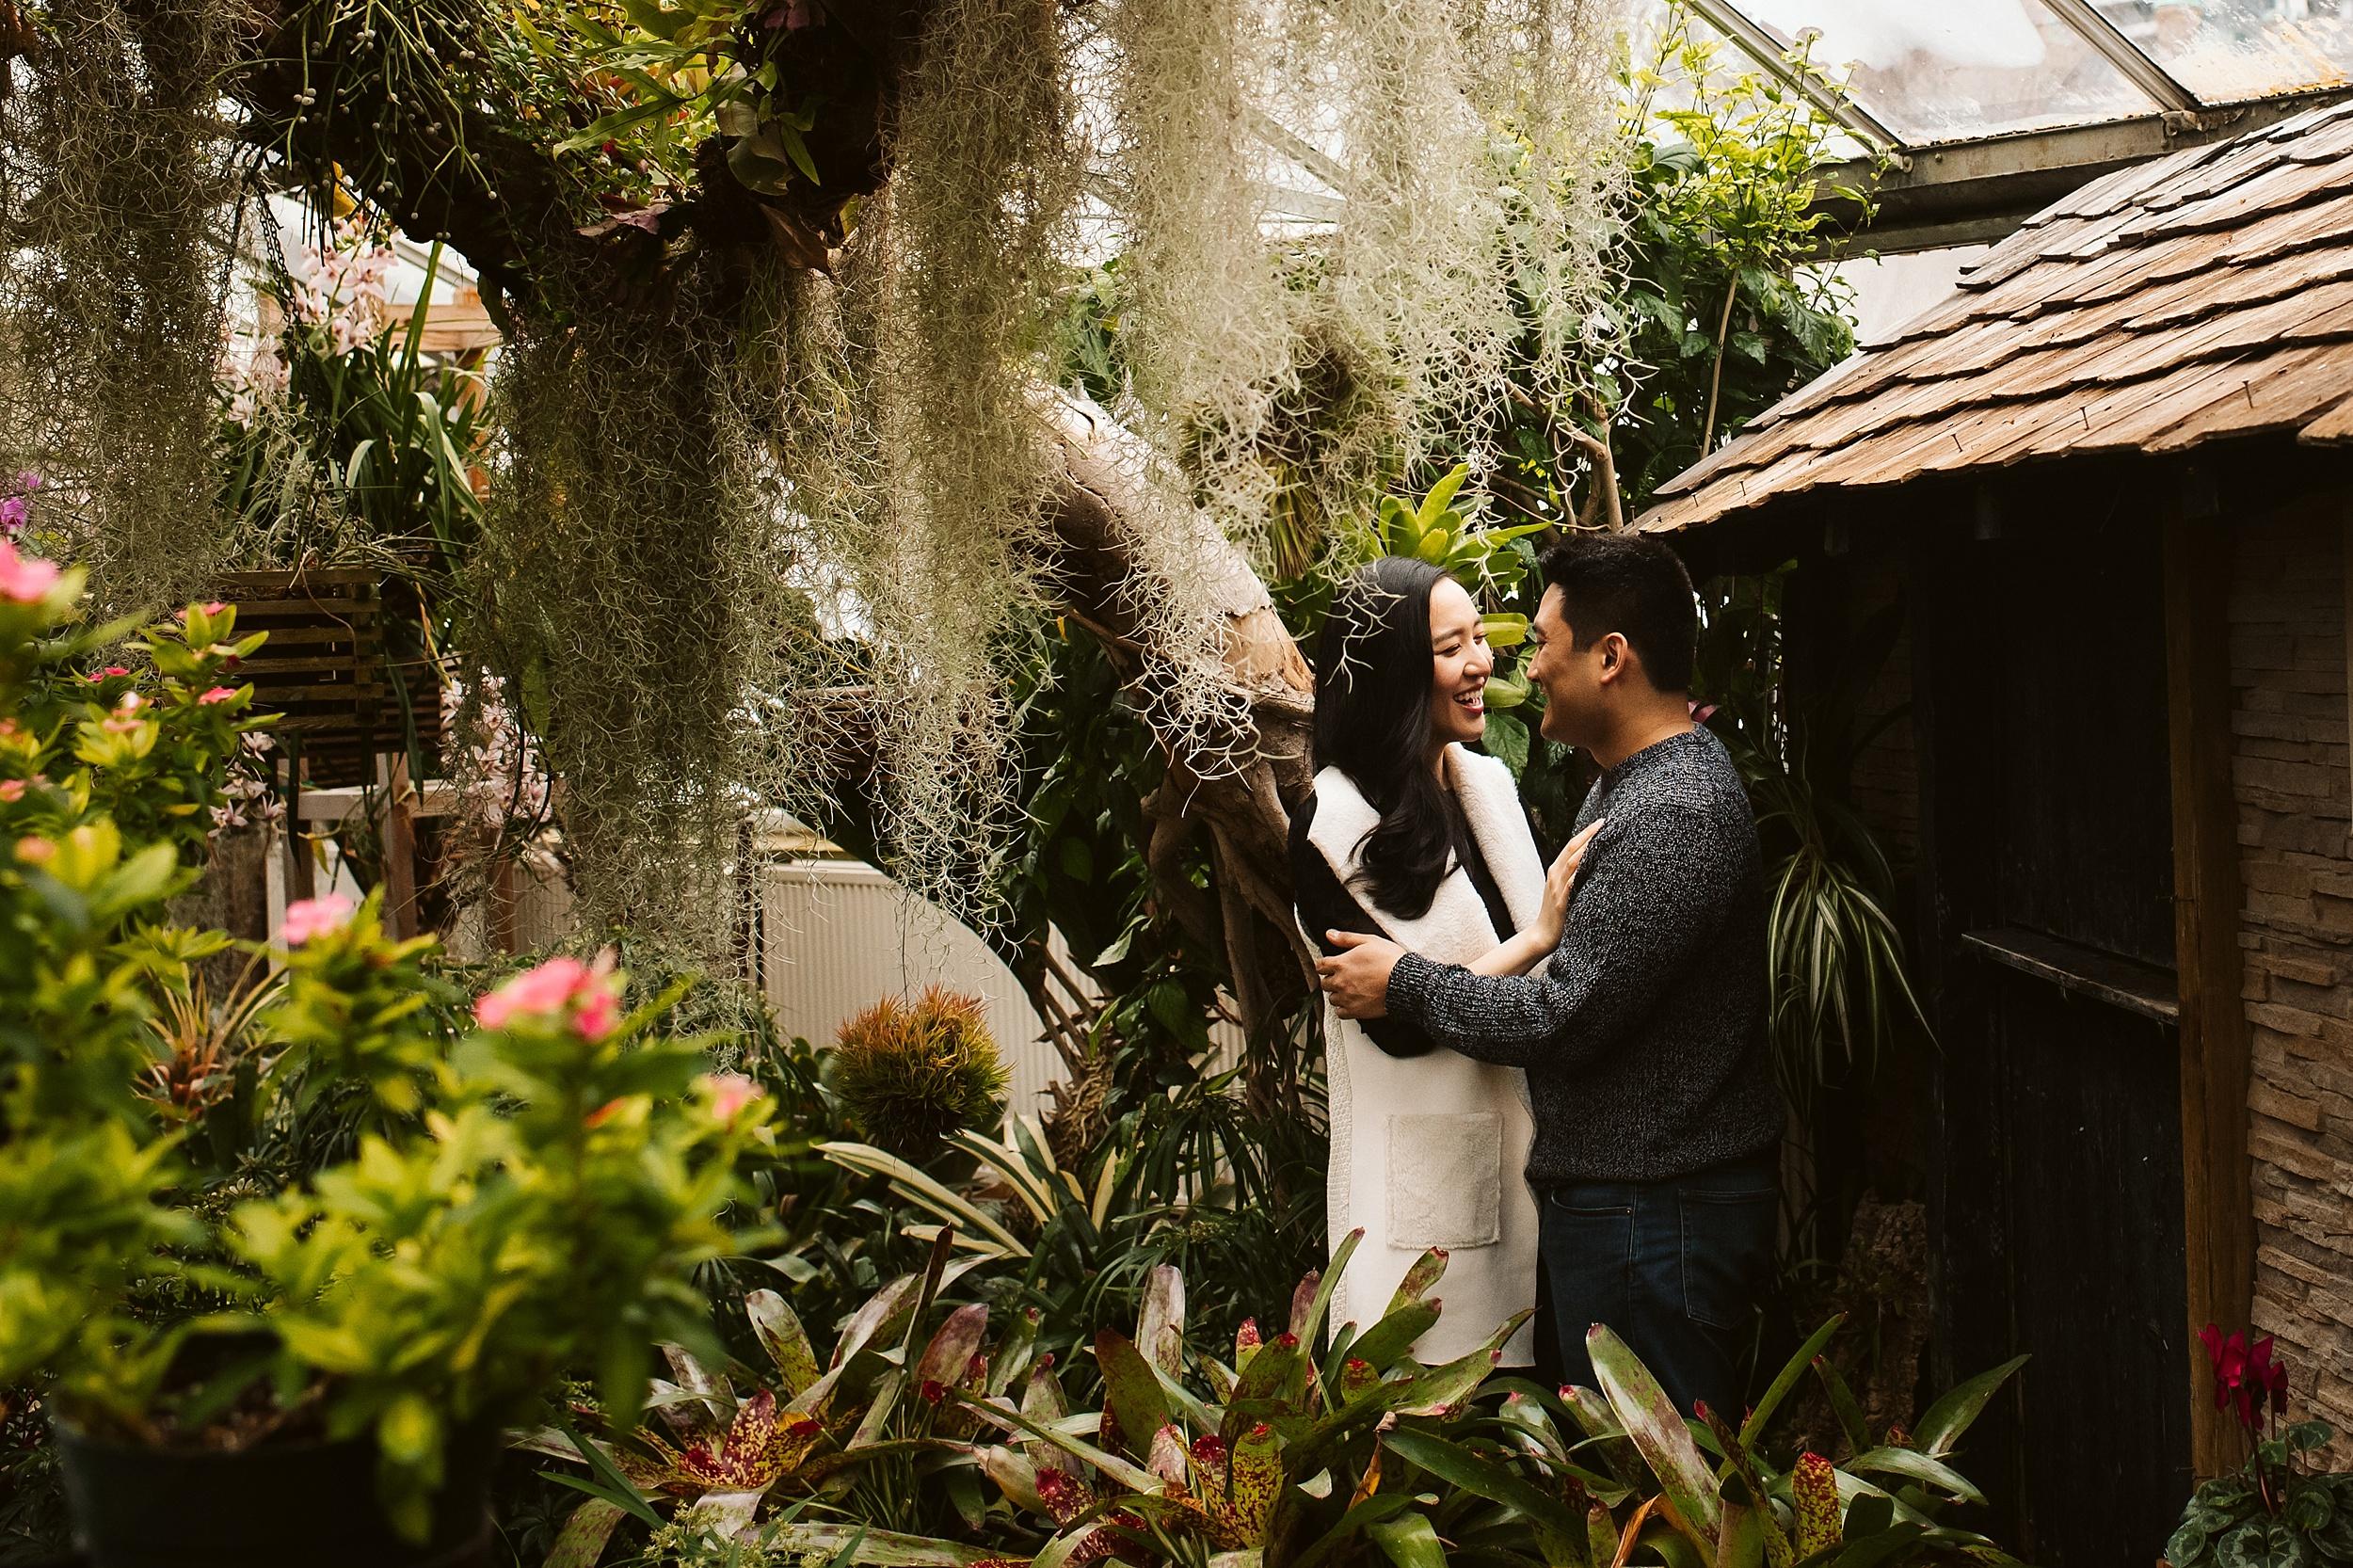 Allan_Gardens_Engagement_Shoot_Toronto_Wedding_Photographer_0006.jpg